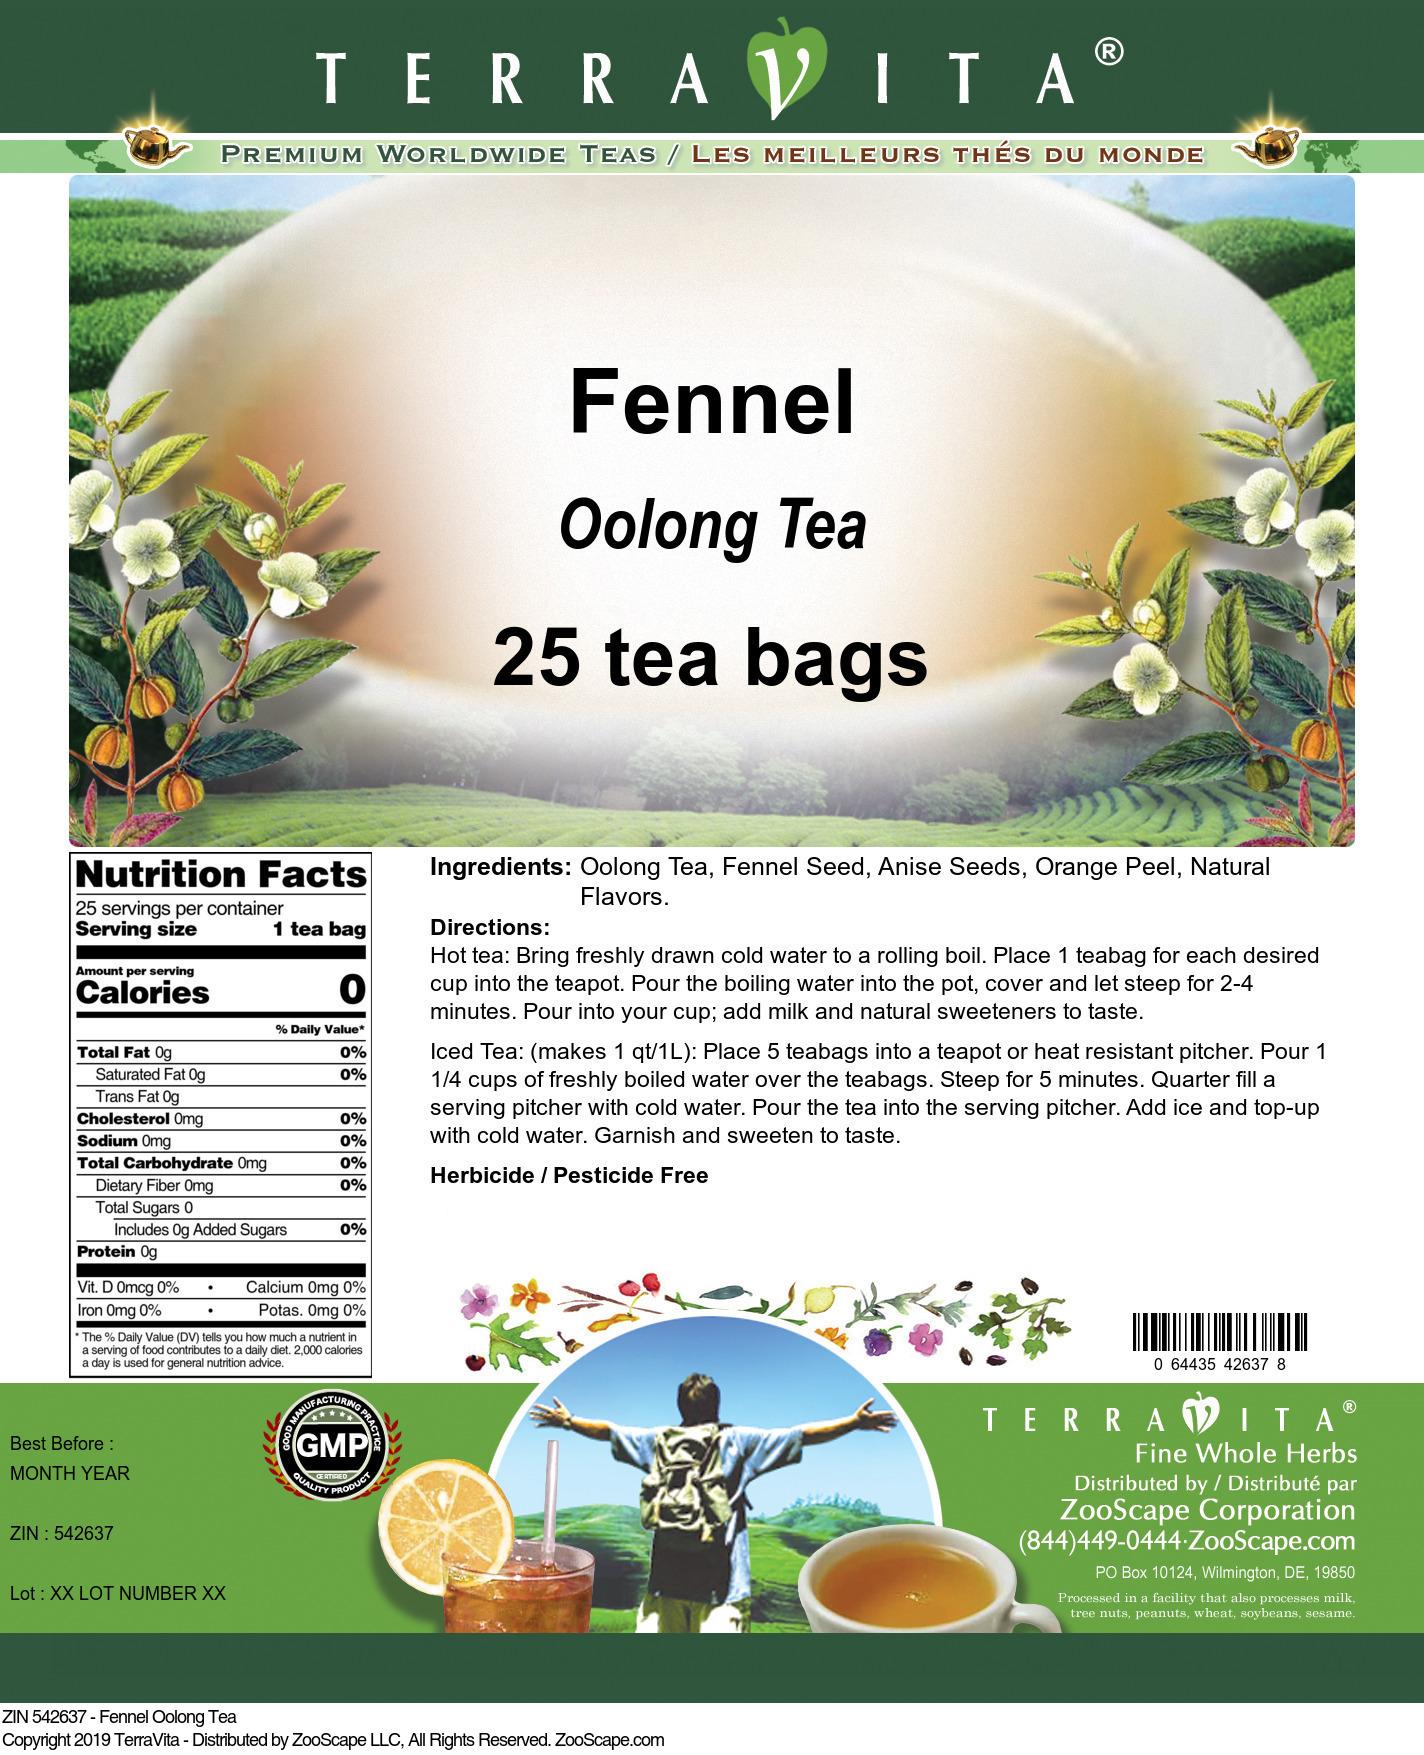 Fennel Oolong Tea